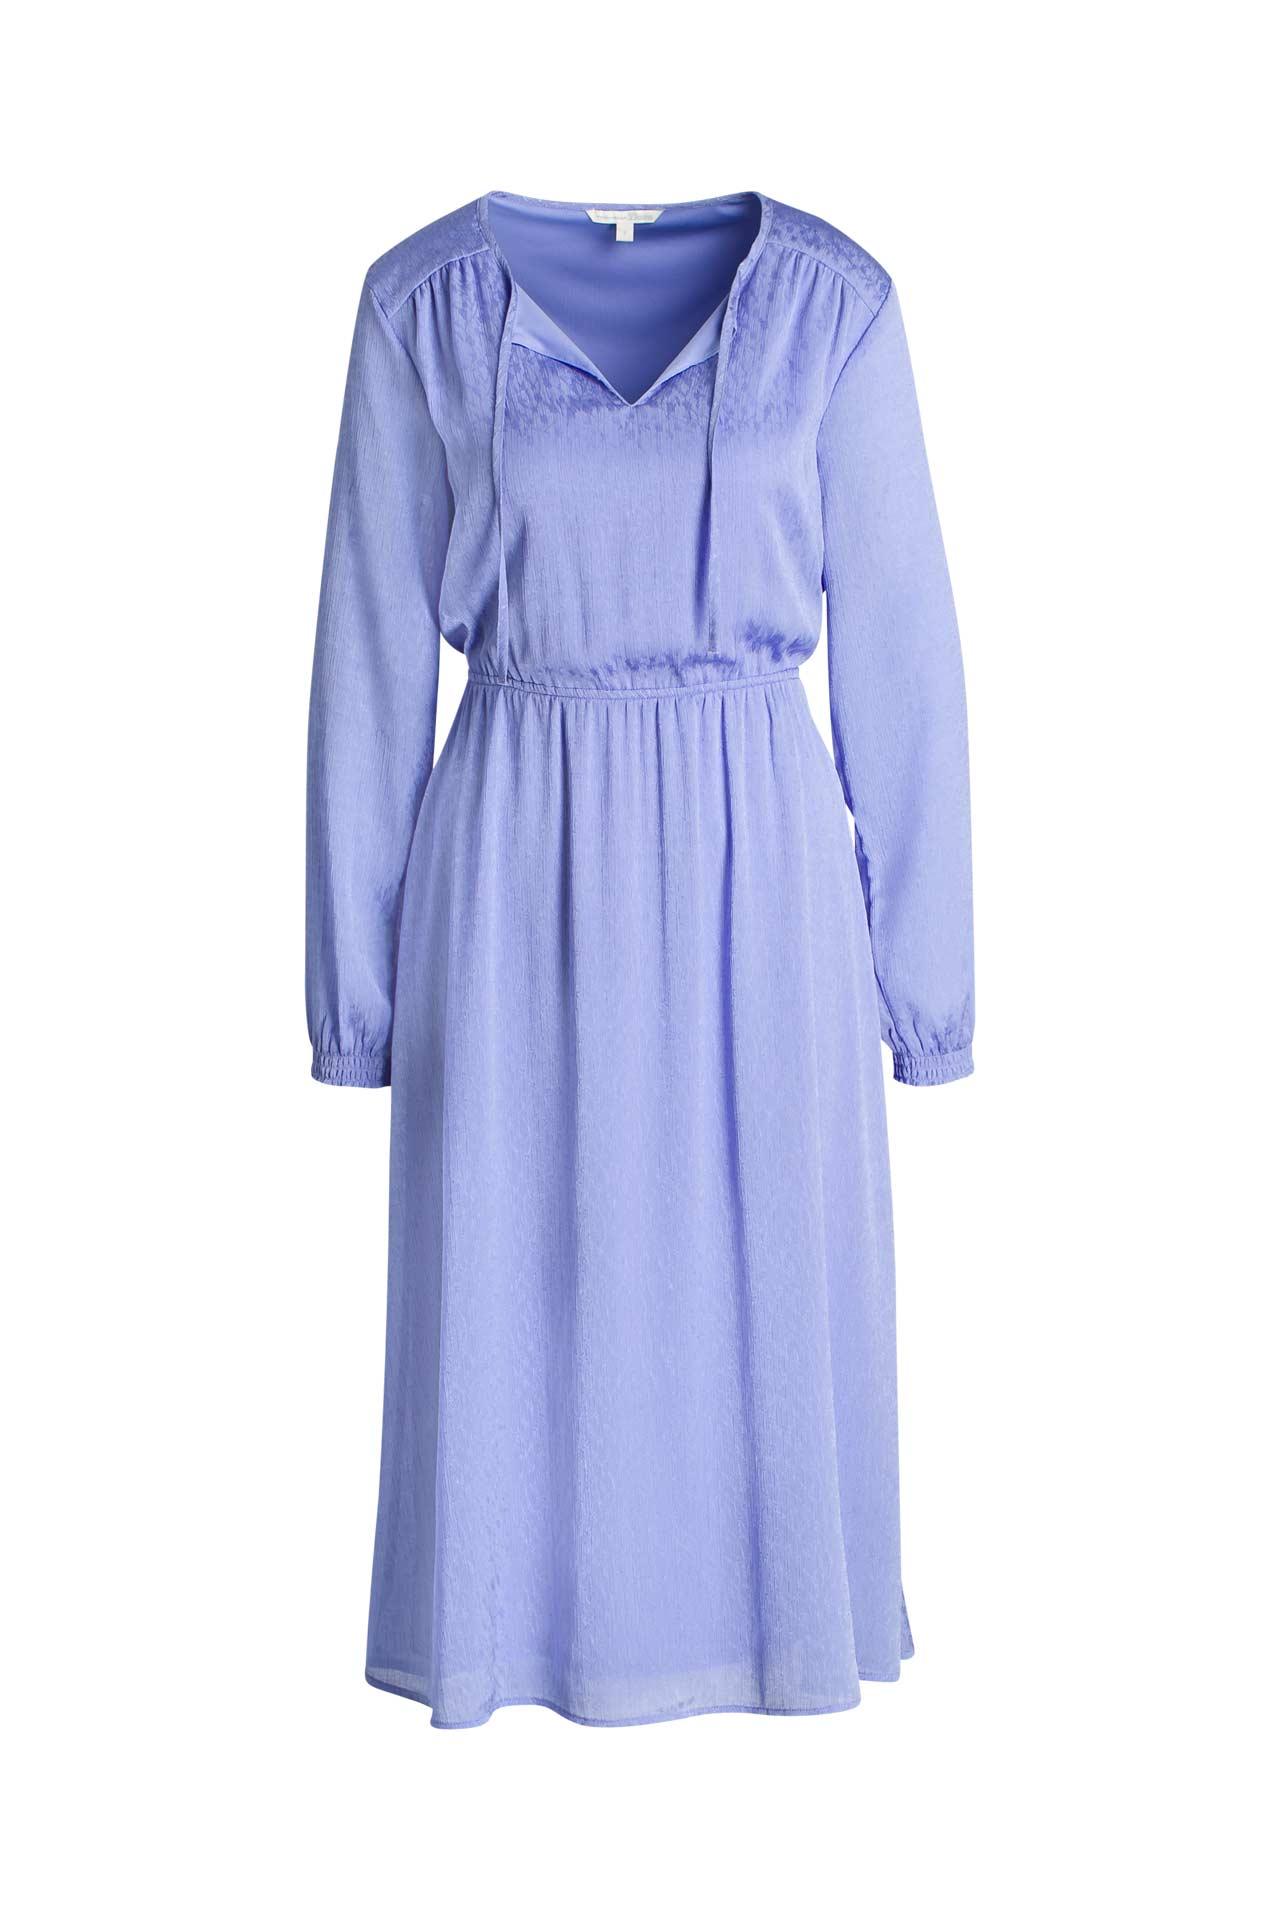 kleid hellblau - tom tailor » günstig online kaufen